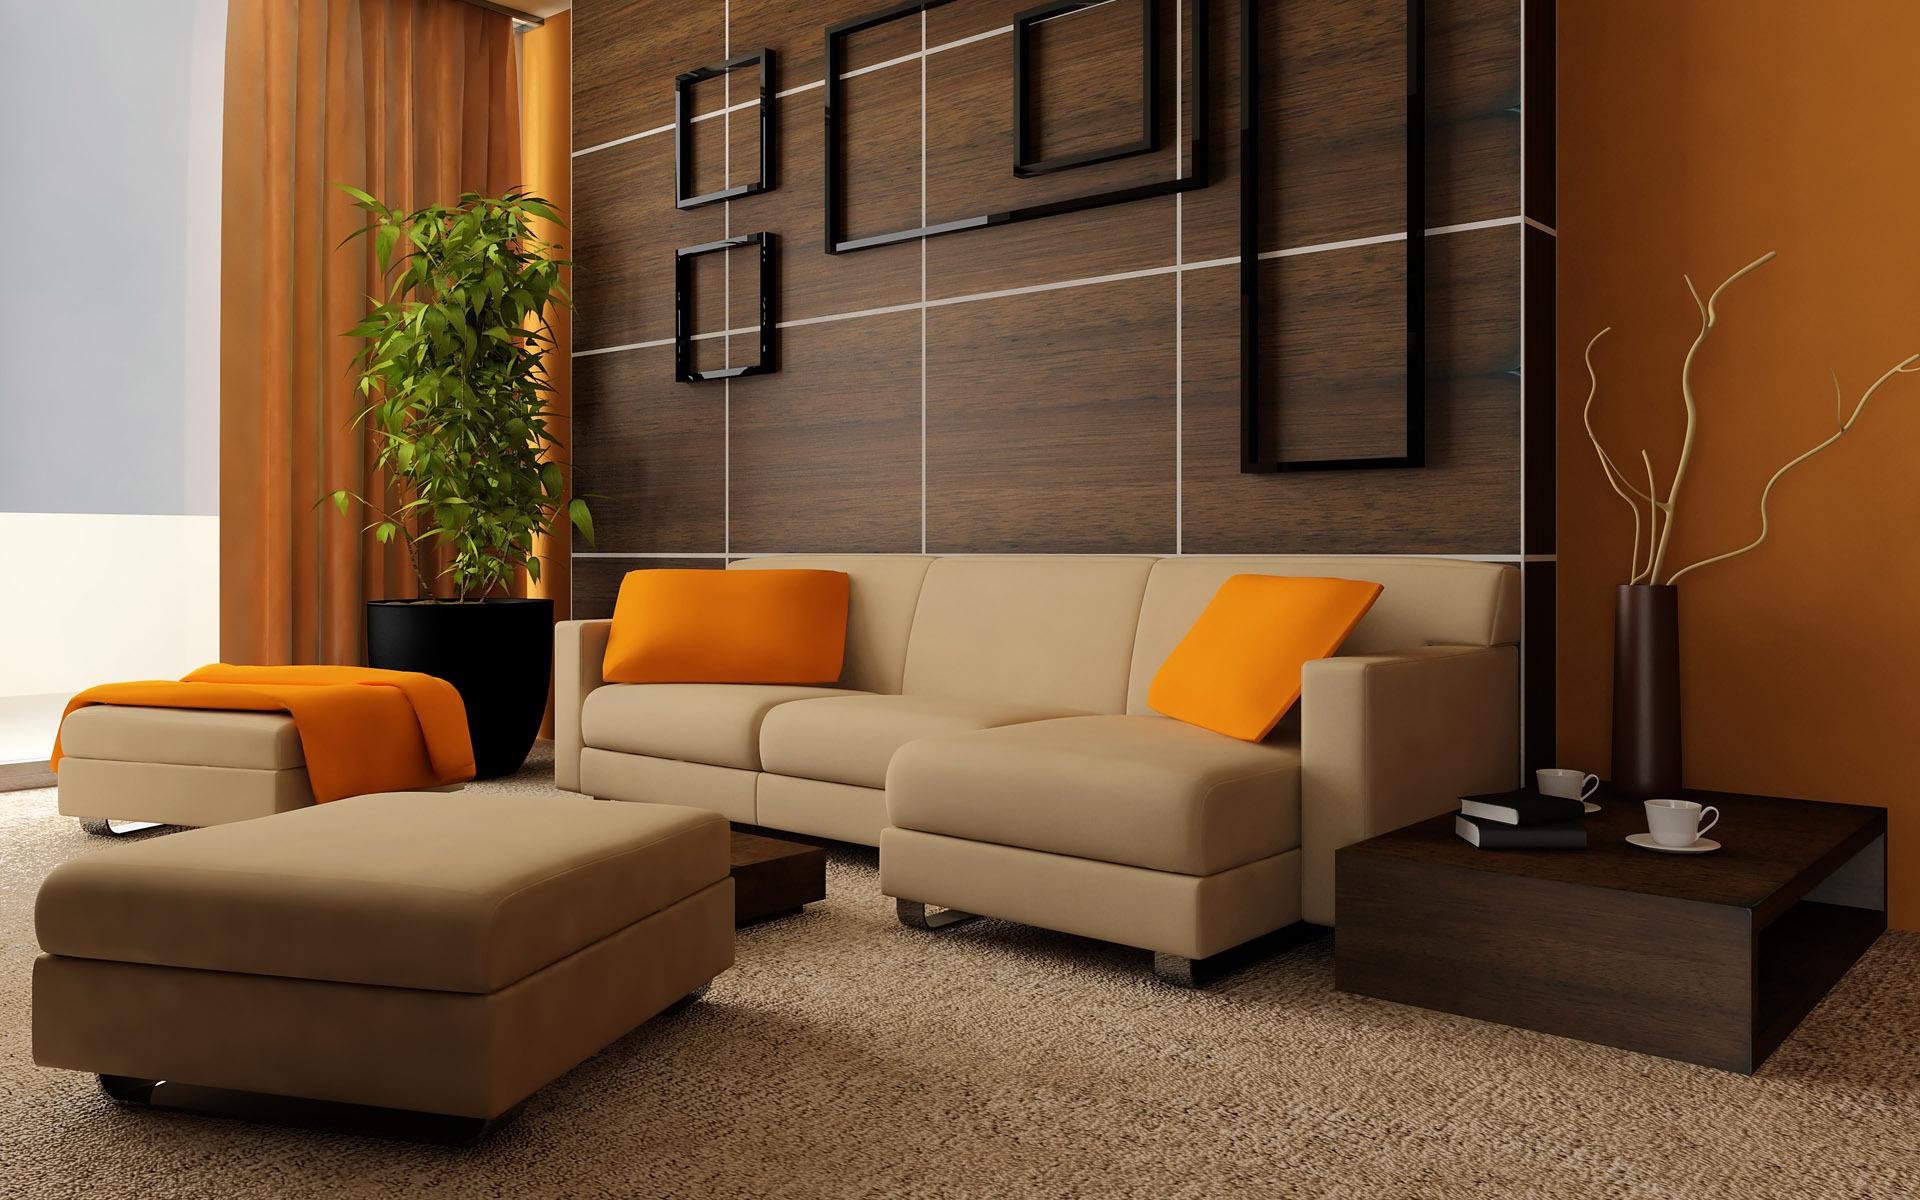 Зал мебель дизайн интерьер